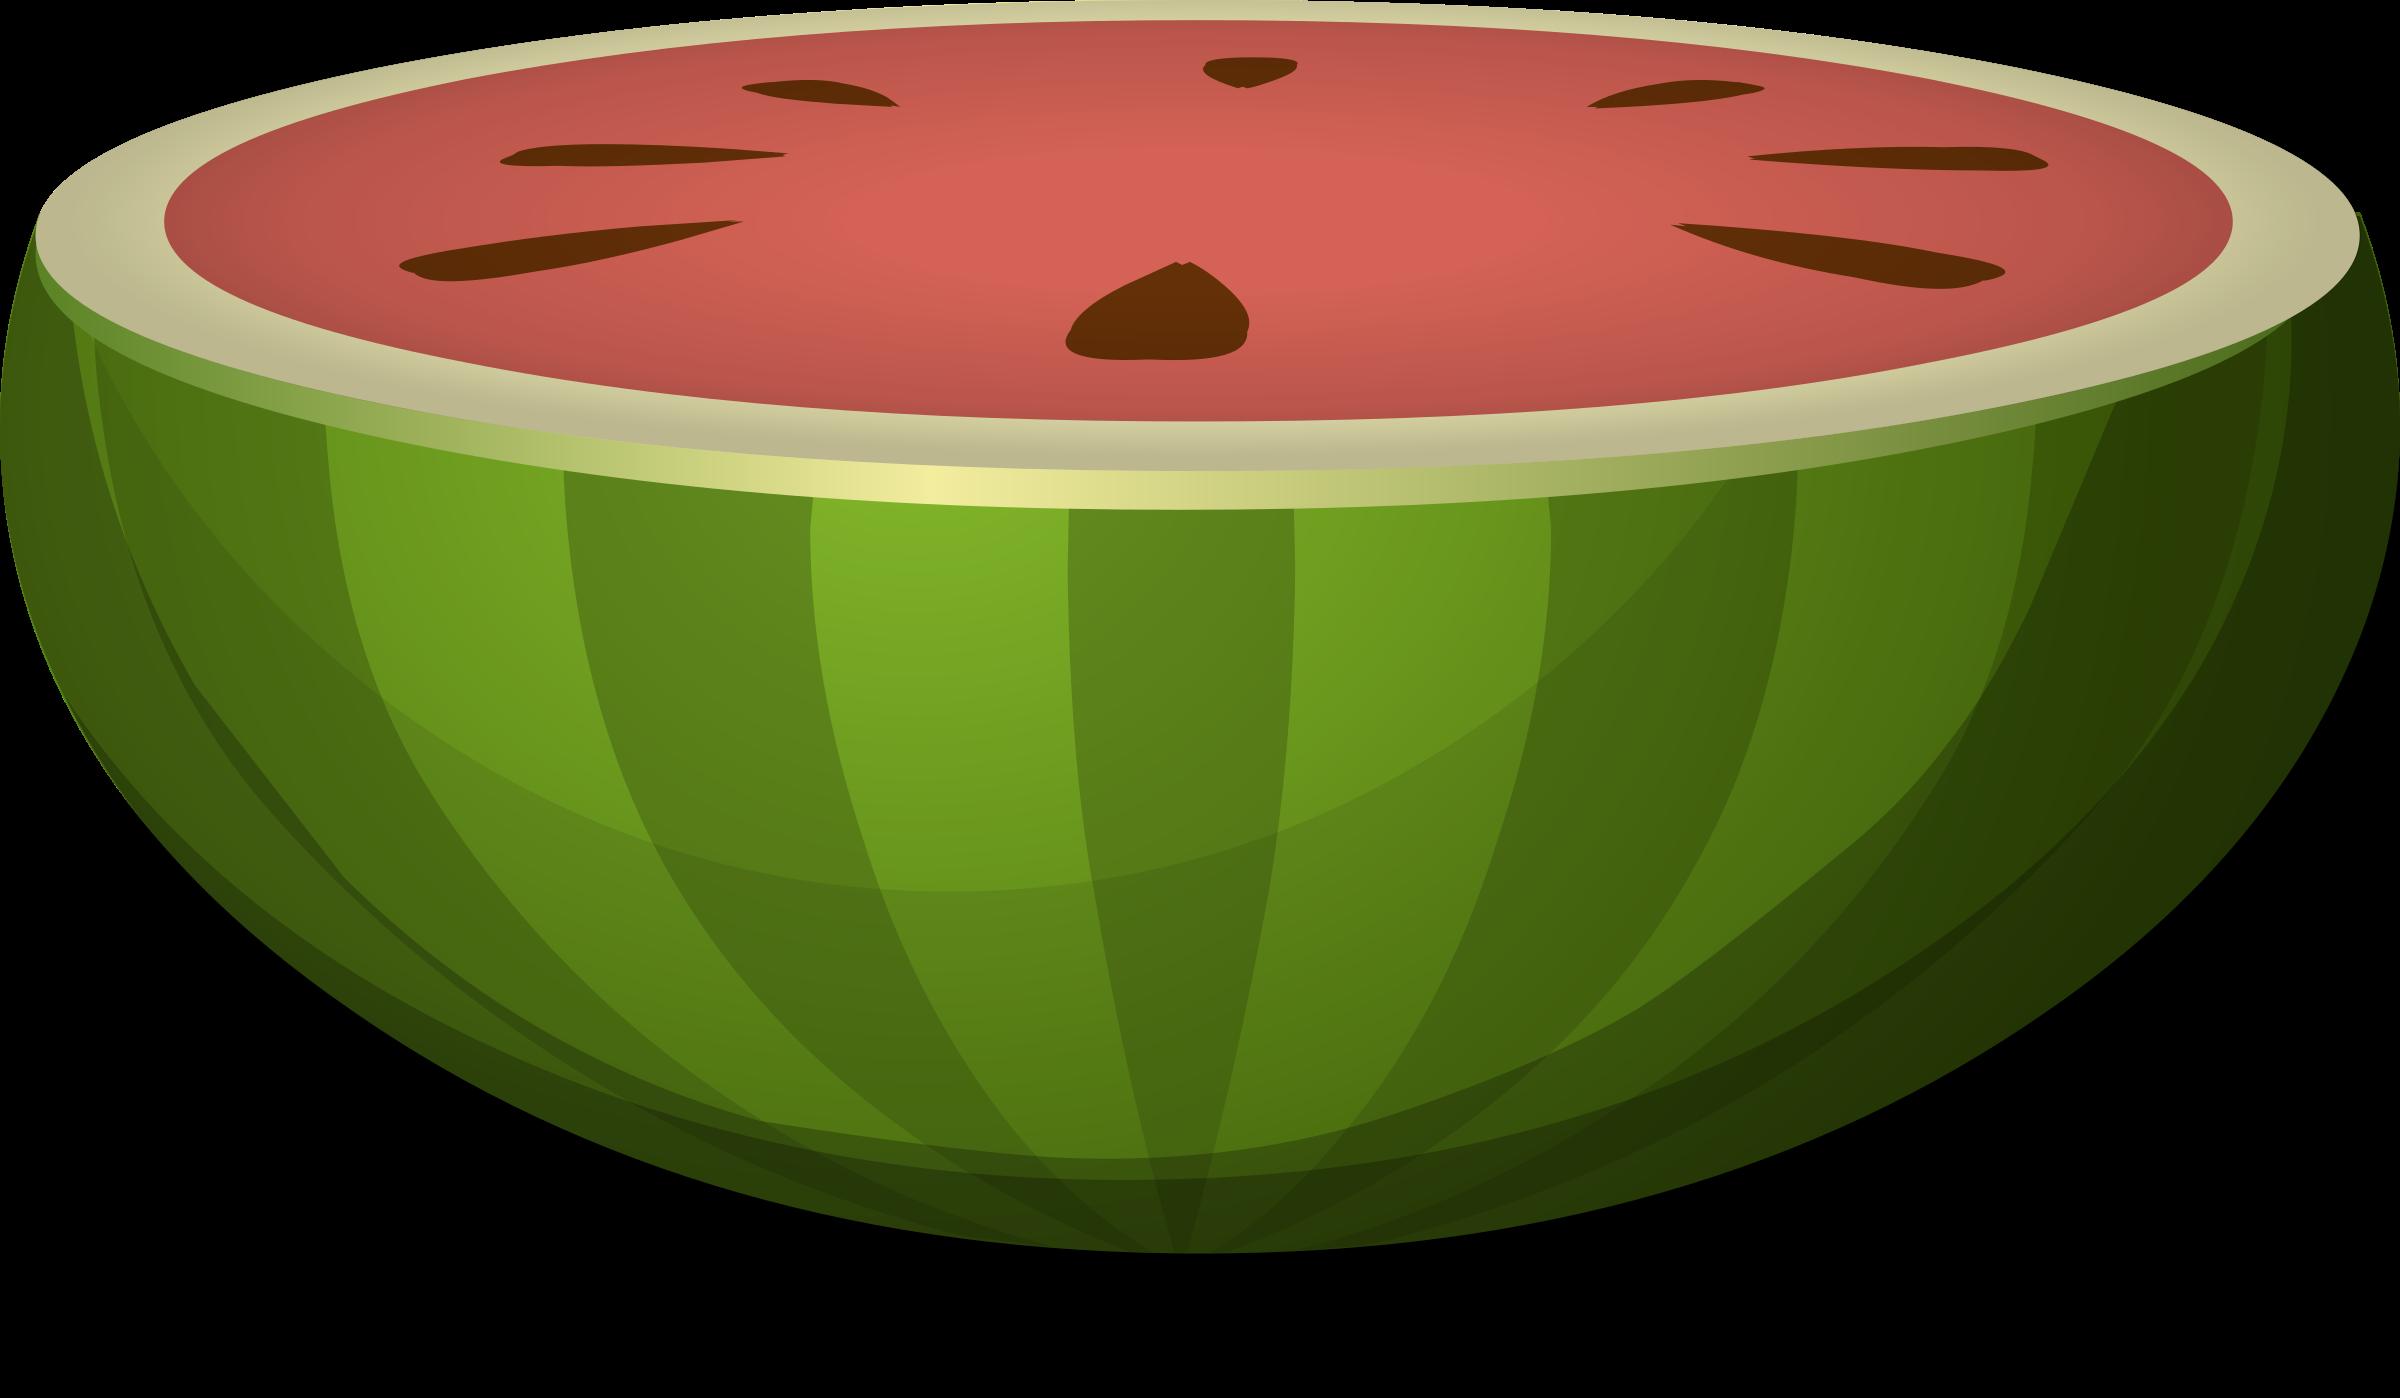 Big image png. Watermelon clipart half watermelon